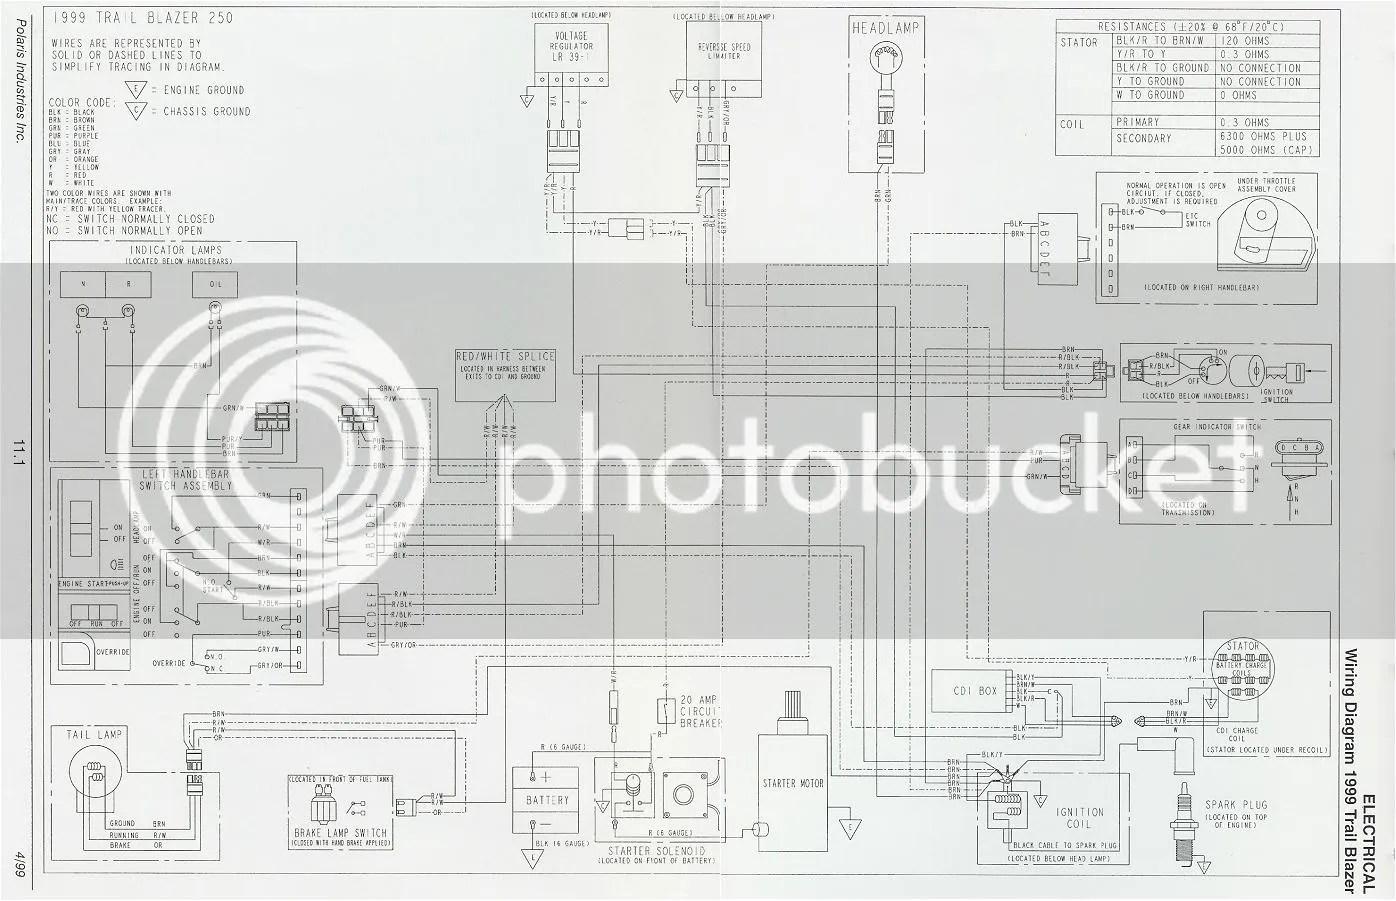 polaris trailblazer 250 wiring diagram photo by slinger10